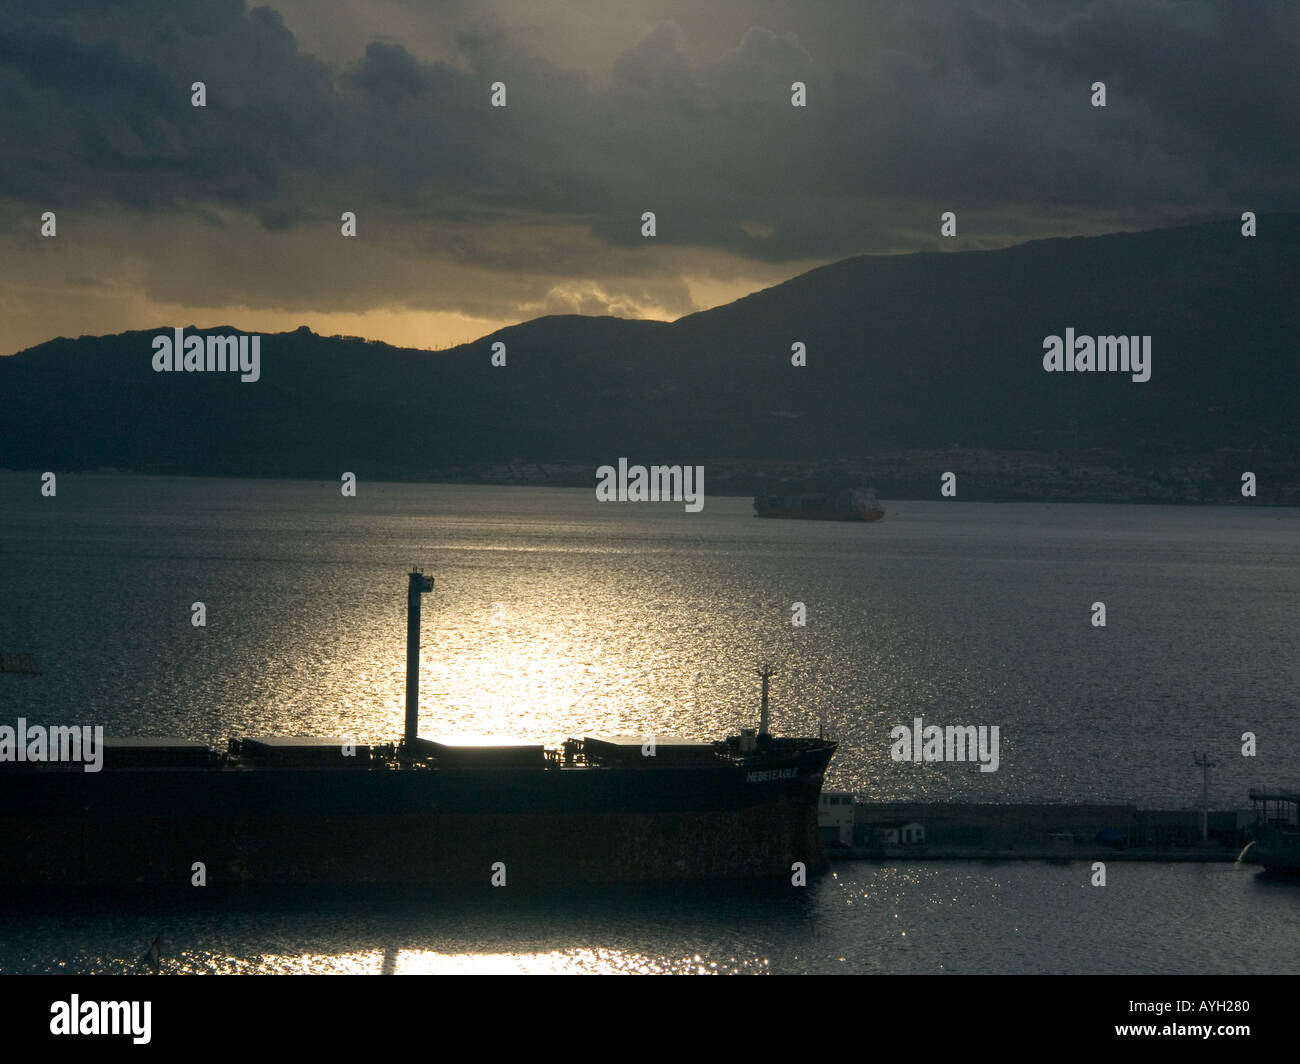 Sunset over The Bay of Gibraltar Shipyard, cloud, freight, ship, shipping, tanker, boat, shipyard, Gibraltarian, - Stock Image